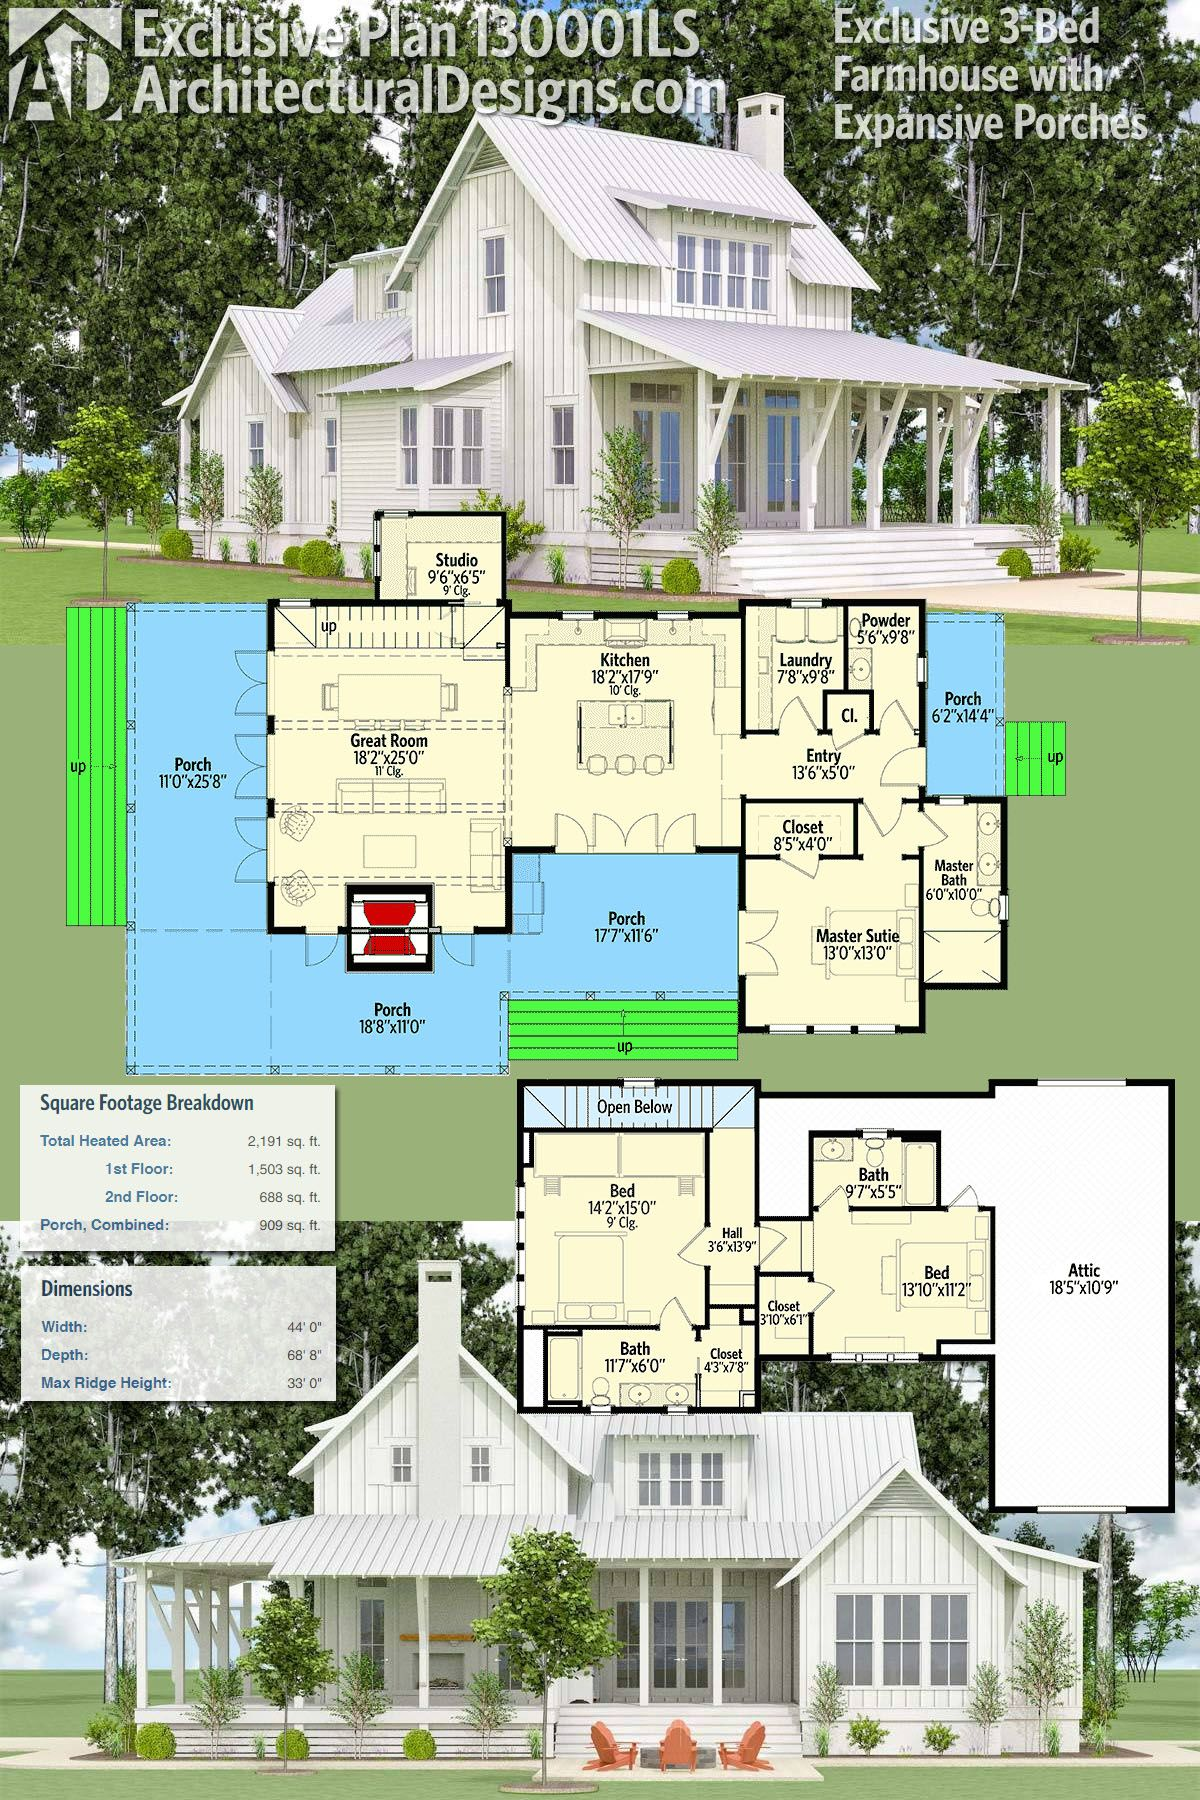 Architectural Designs Exclusive Farmhouse Plan 130001lls Has Porches On 3 Sides Inside Farmhouse Floor Plans House Plans Farmhouse Modern Farmhouse Floorplan